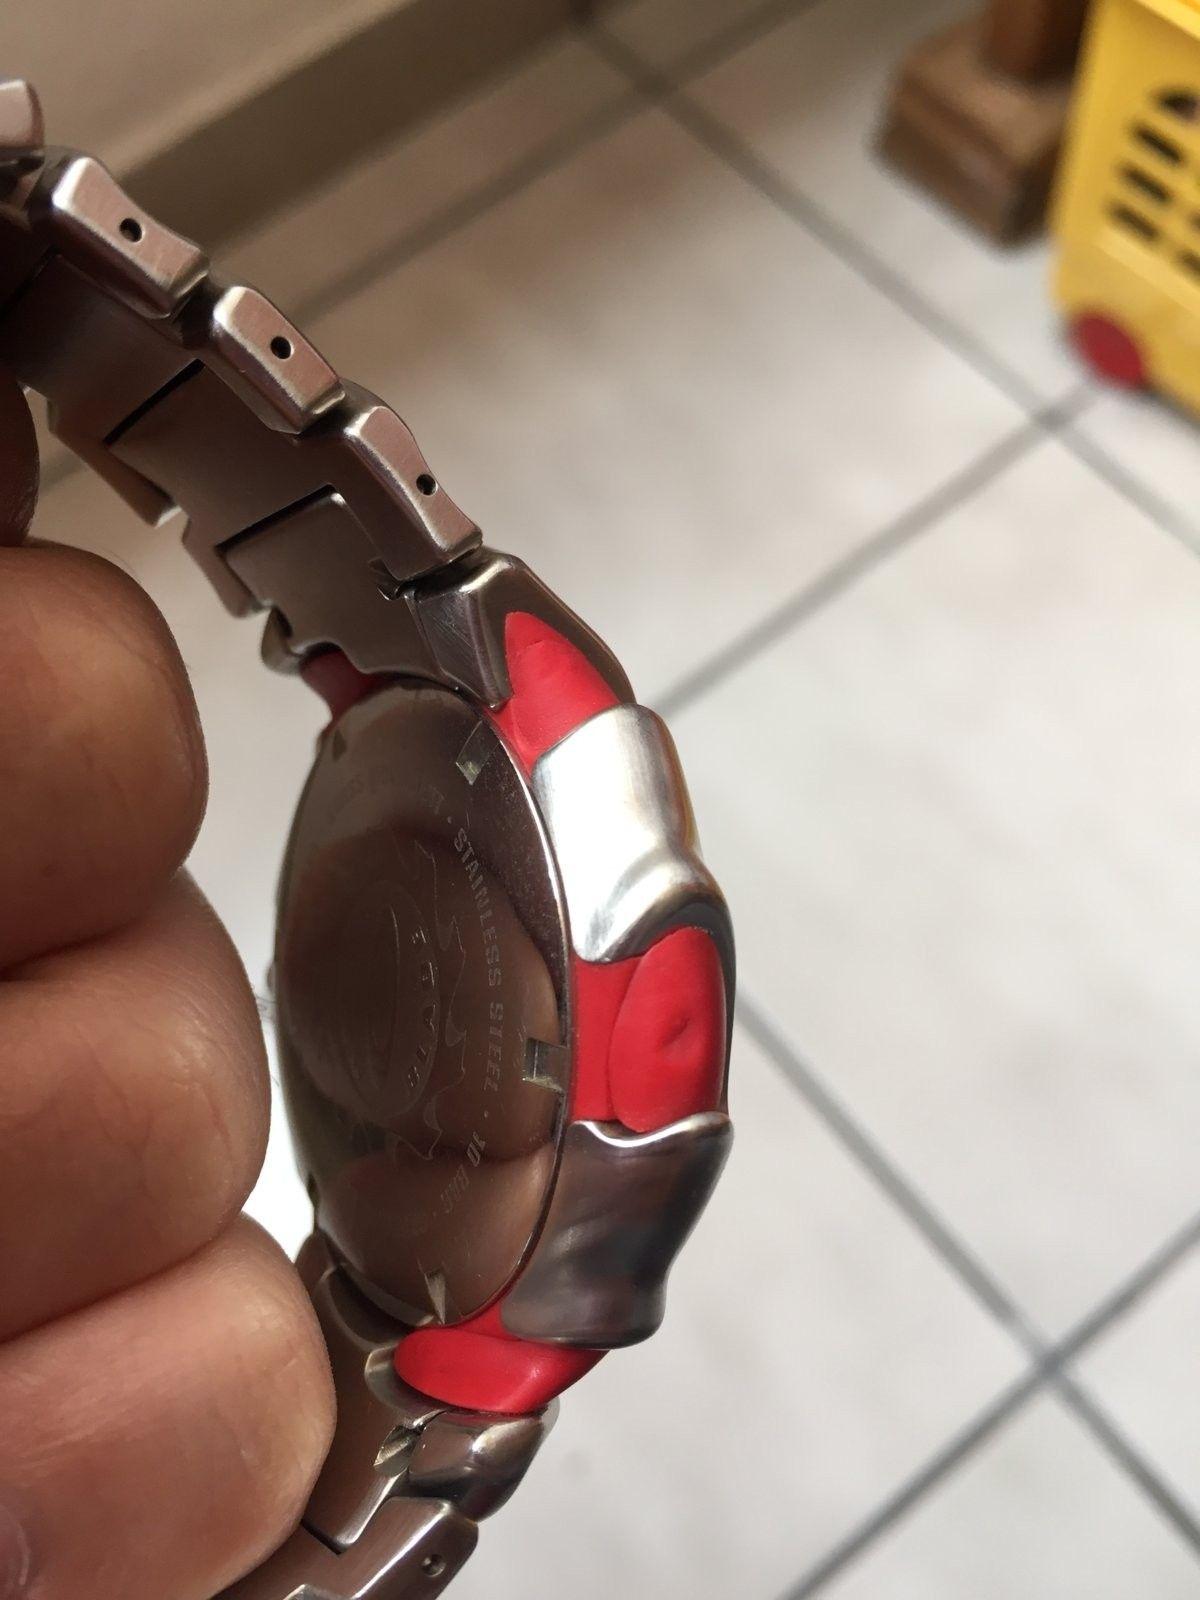 Blade Watch - IMG_2745.JPG